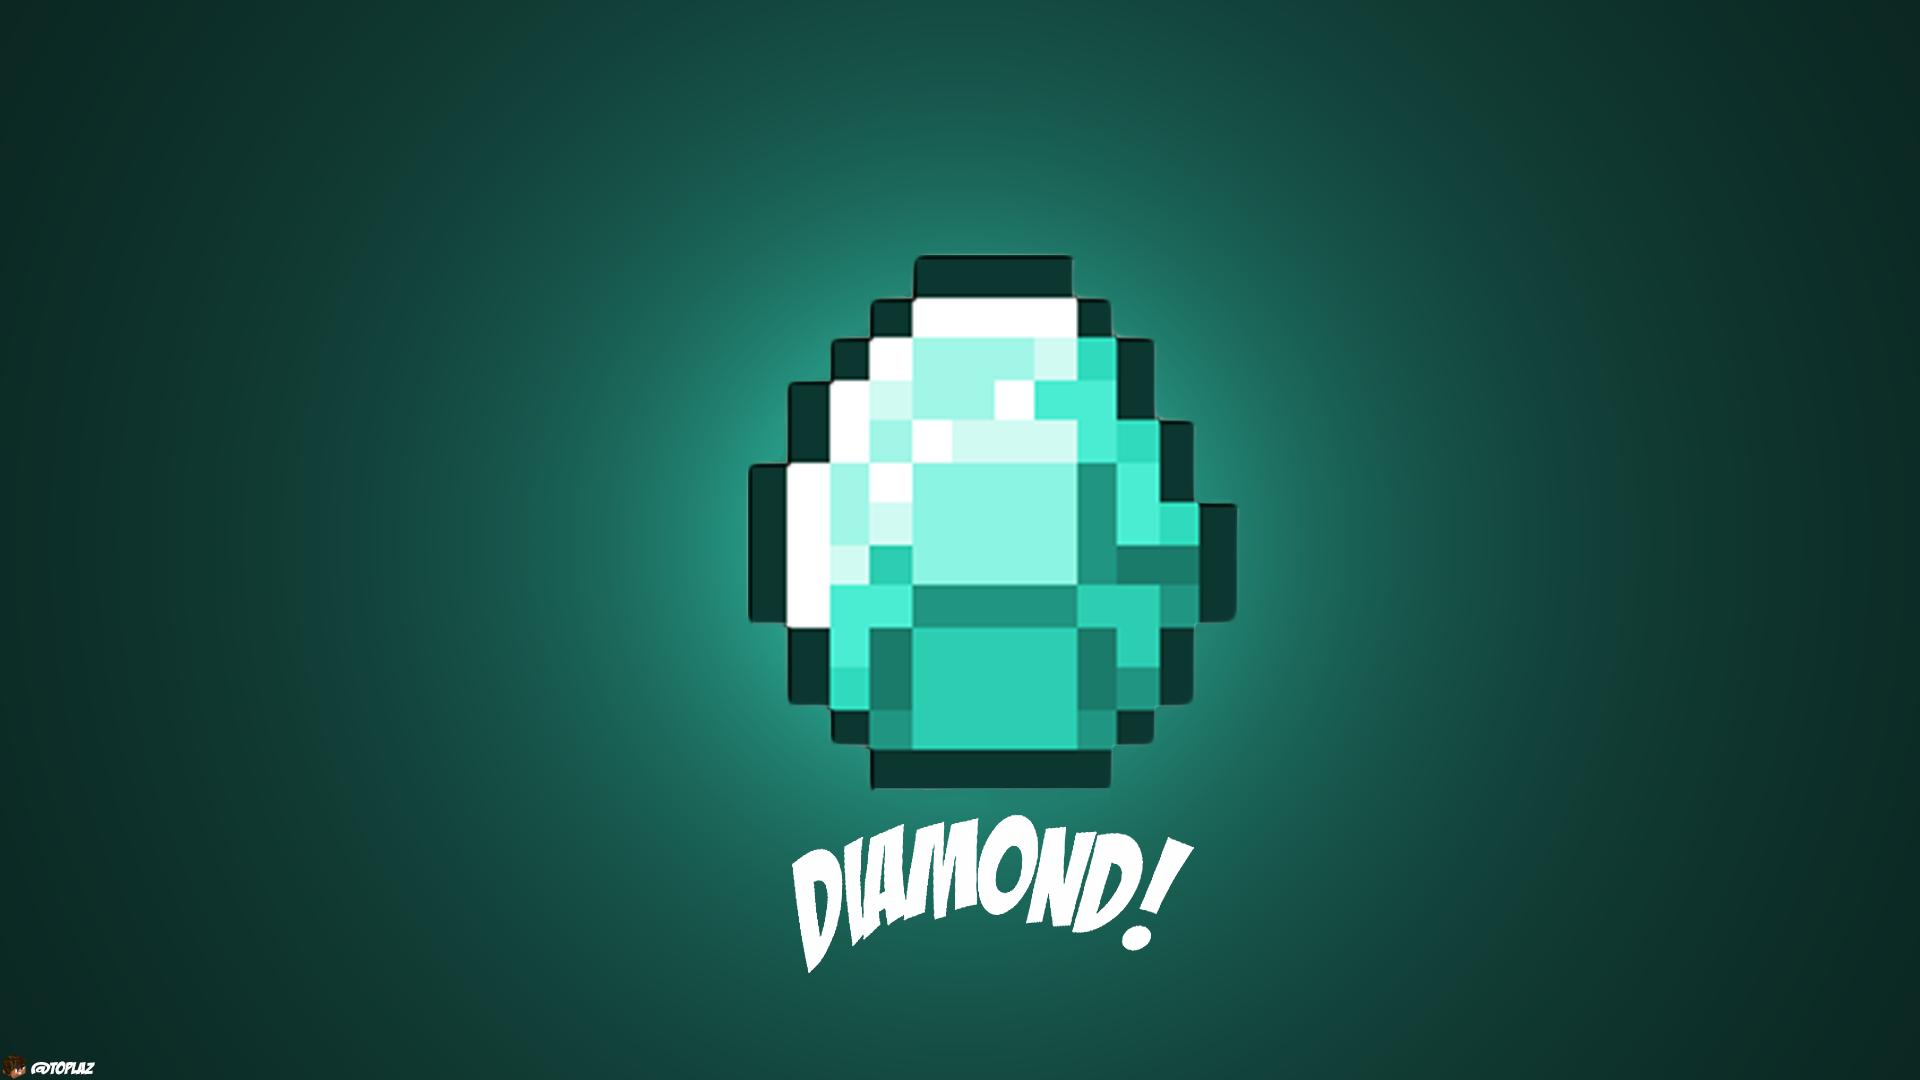 minecraft diamond wallpaper hd   Large Images 1920x1080